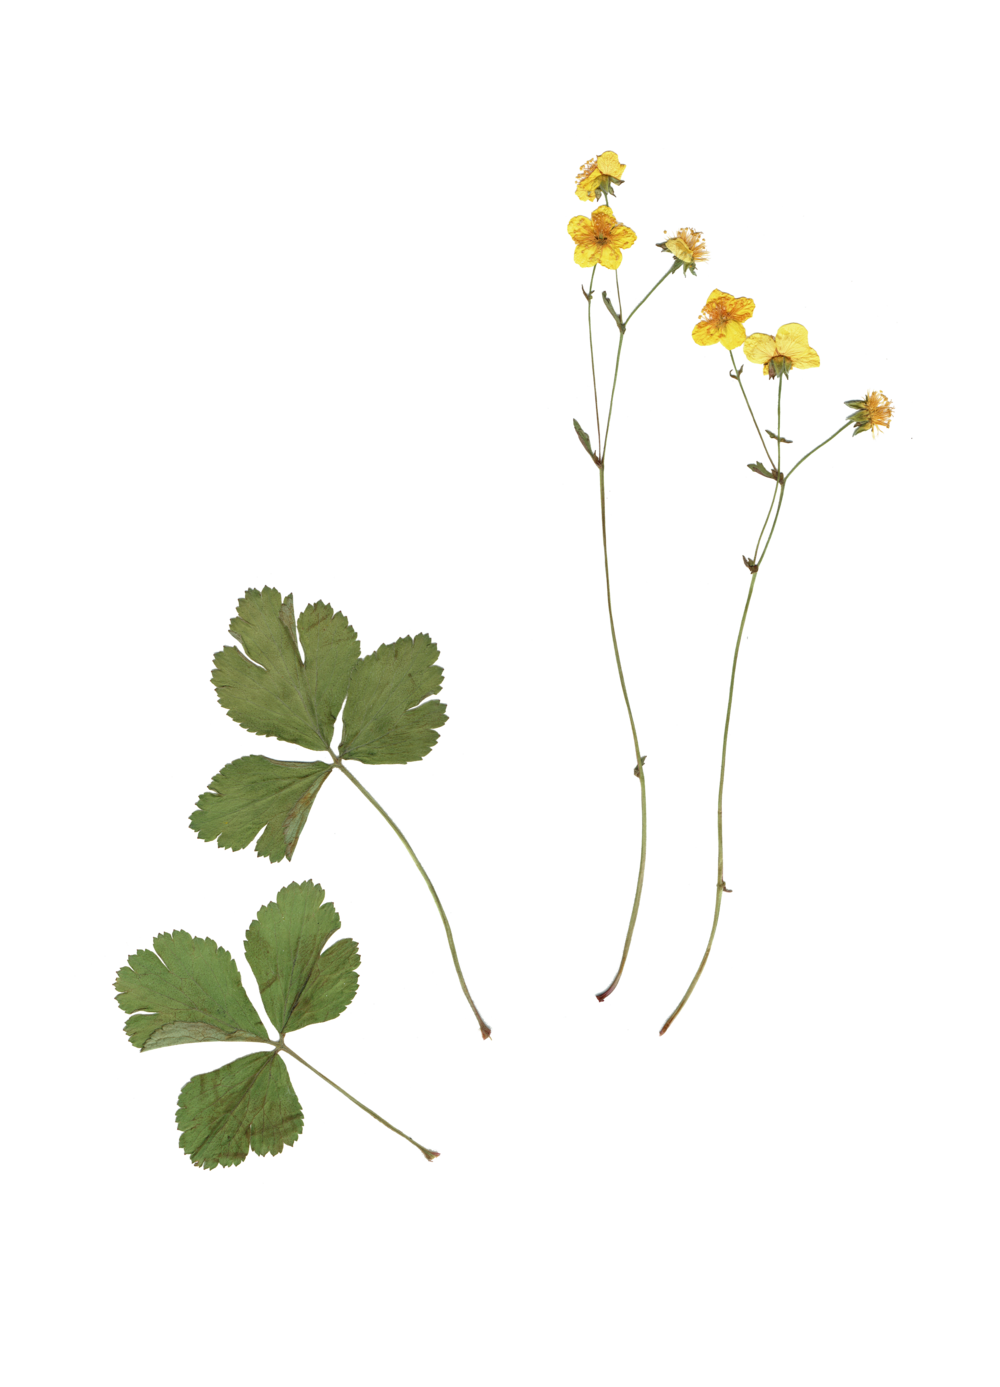 waldsteinia_geoides.png